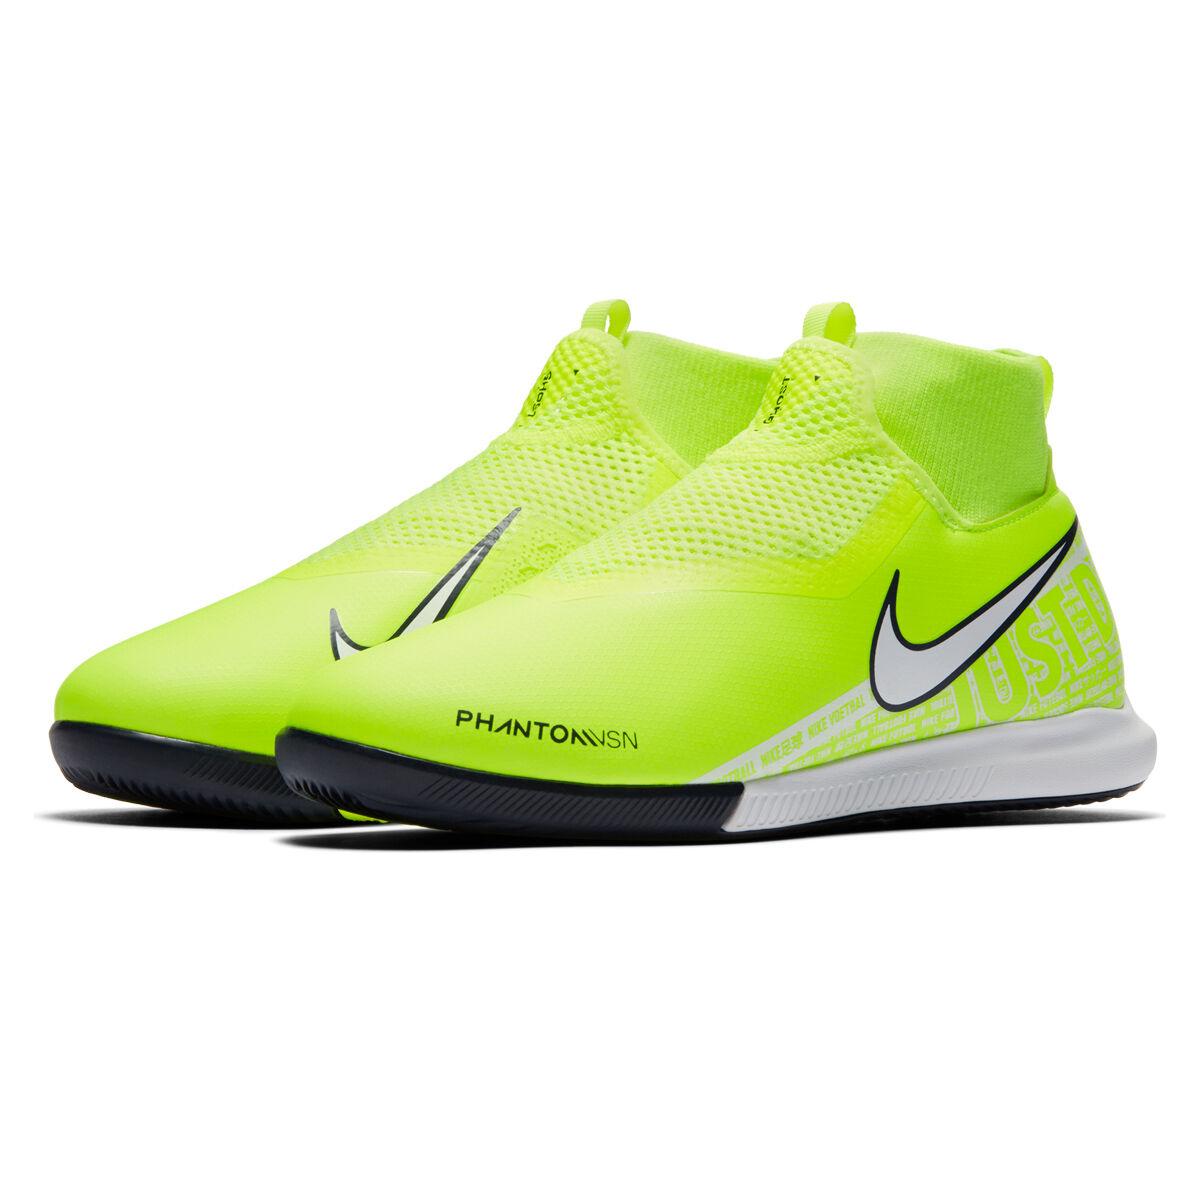 Nike Phantom Vision Academy Dynamic Fit